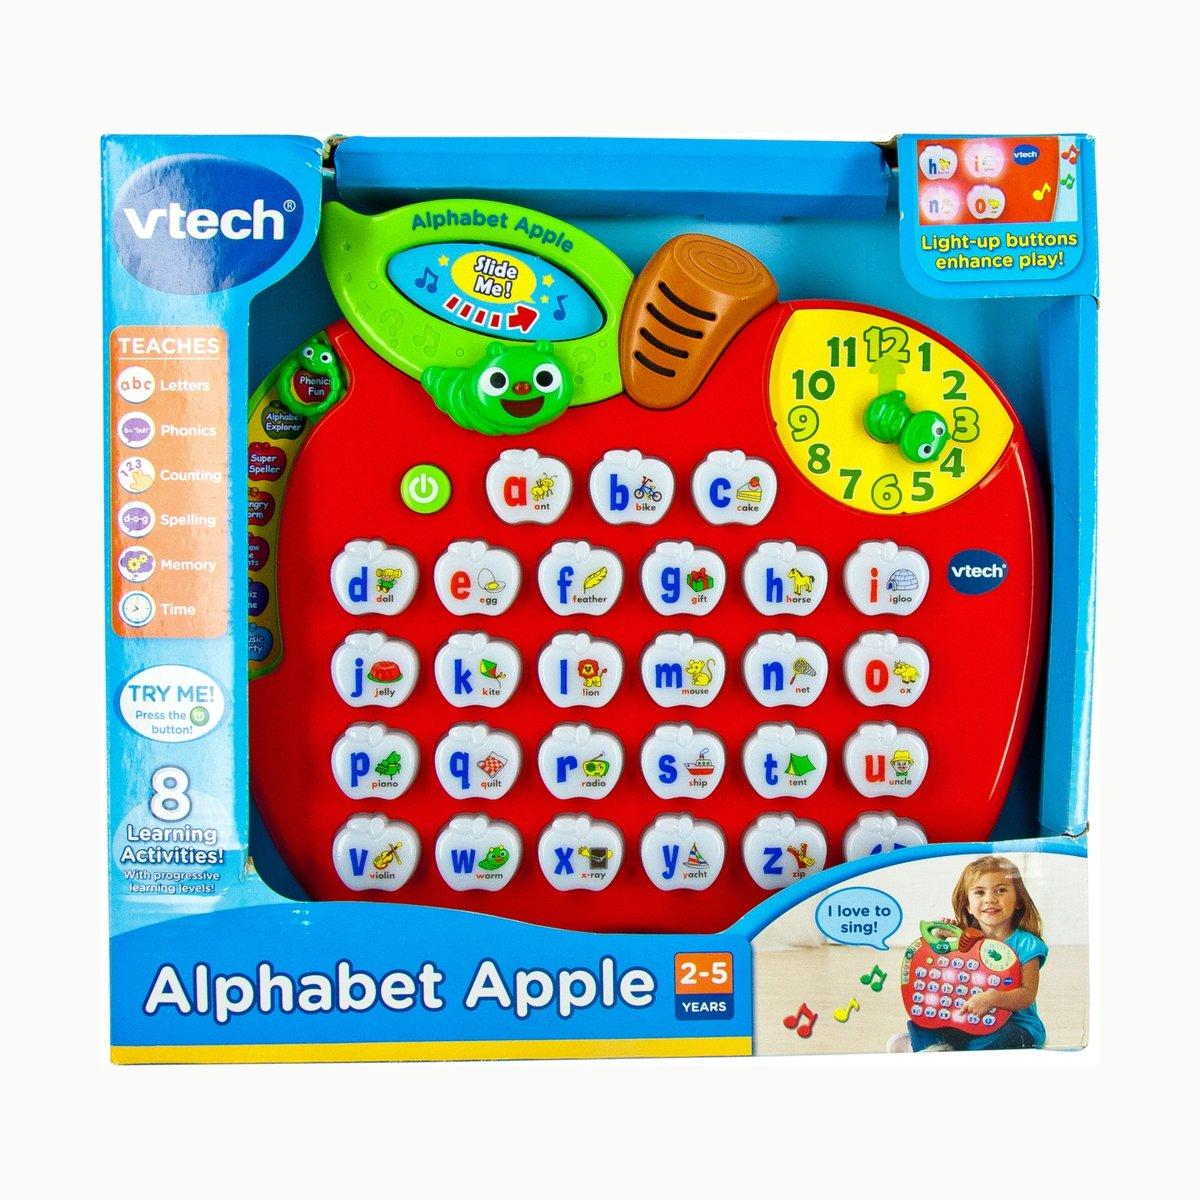 Alphabet Apple Toy